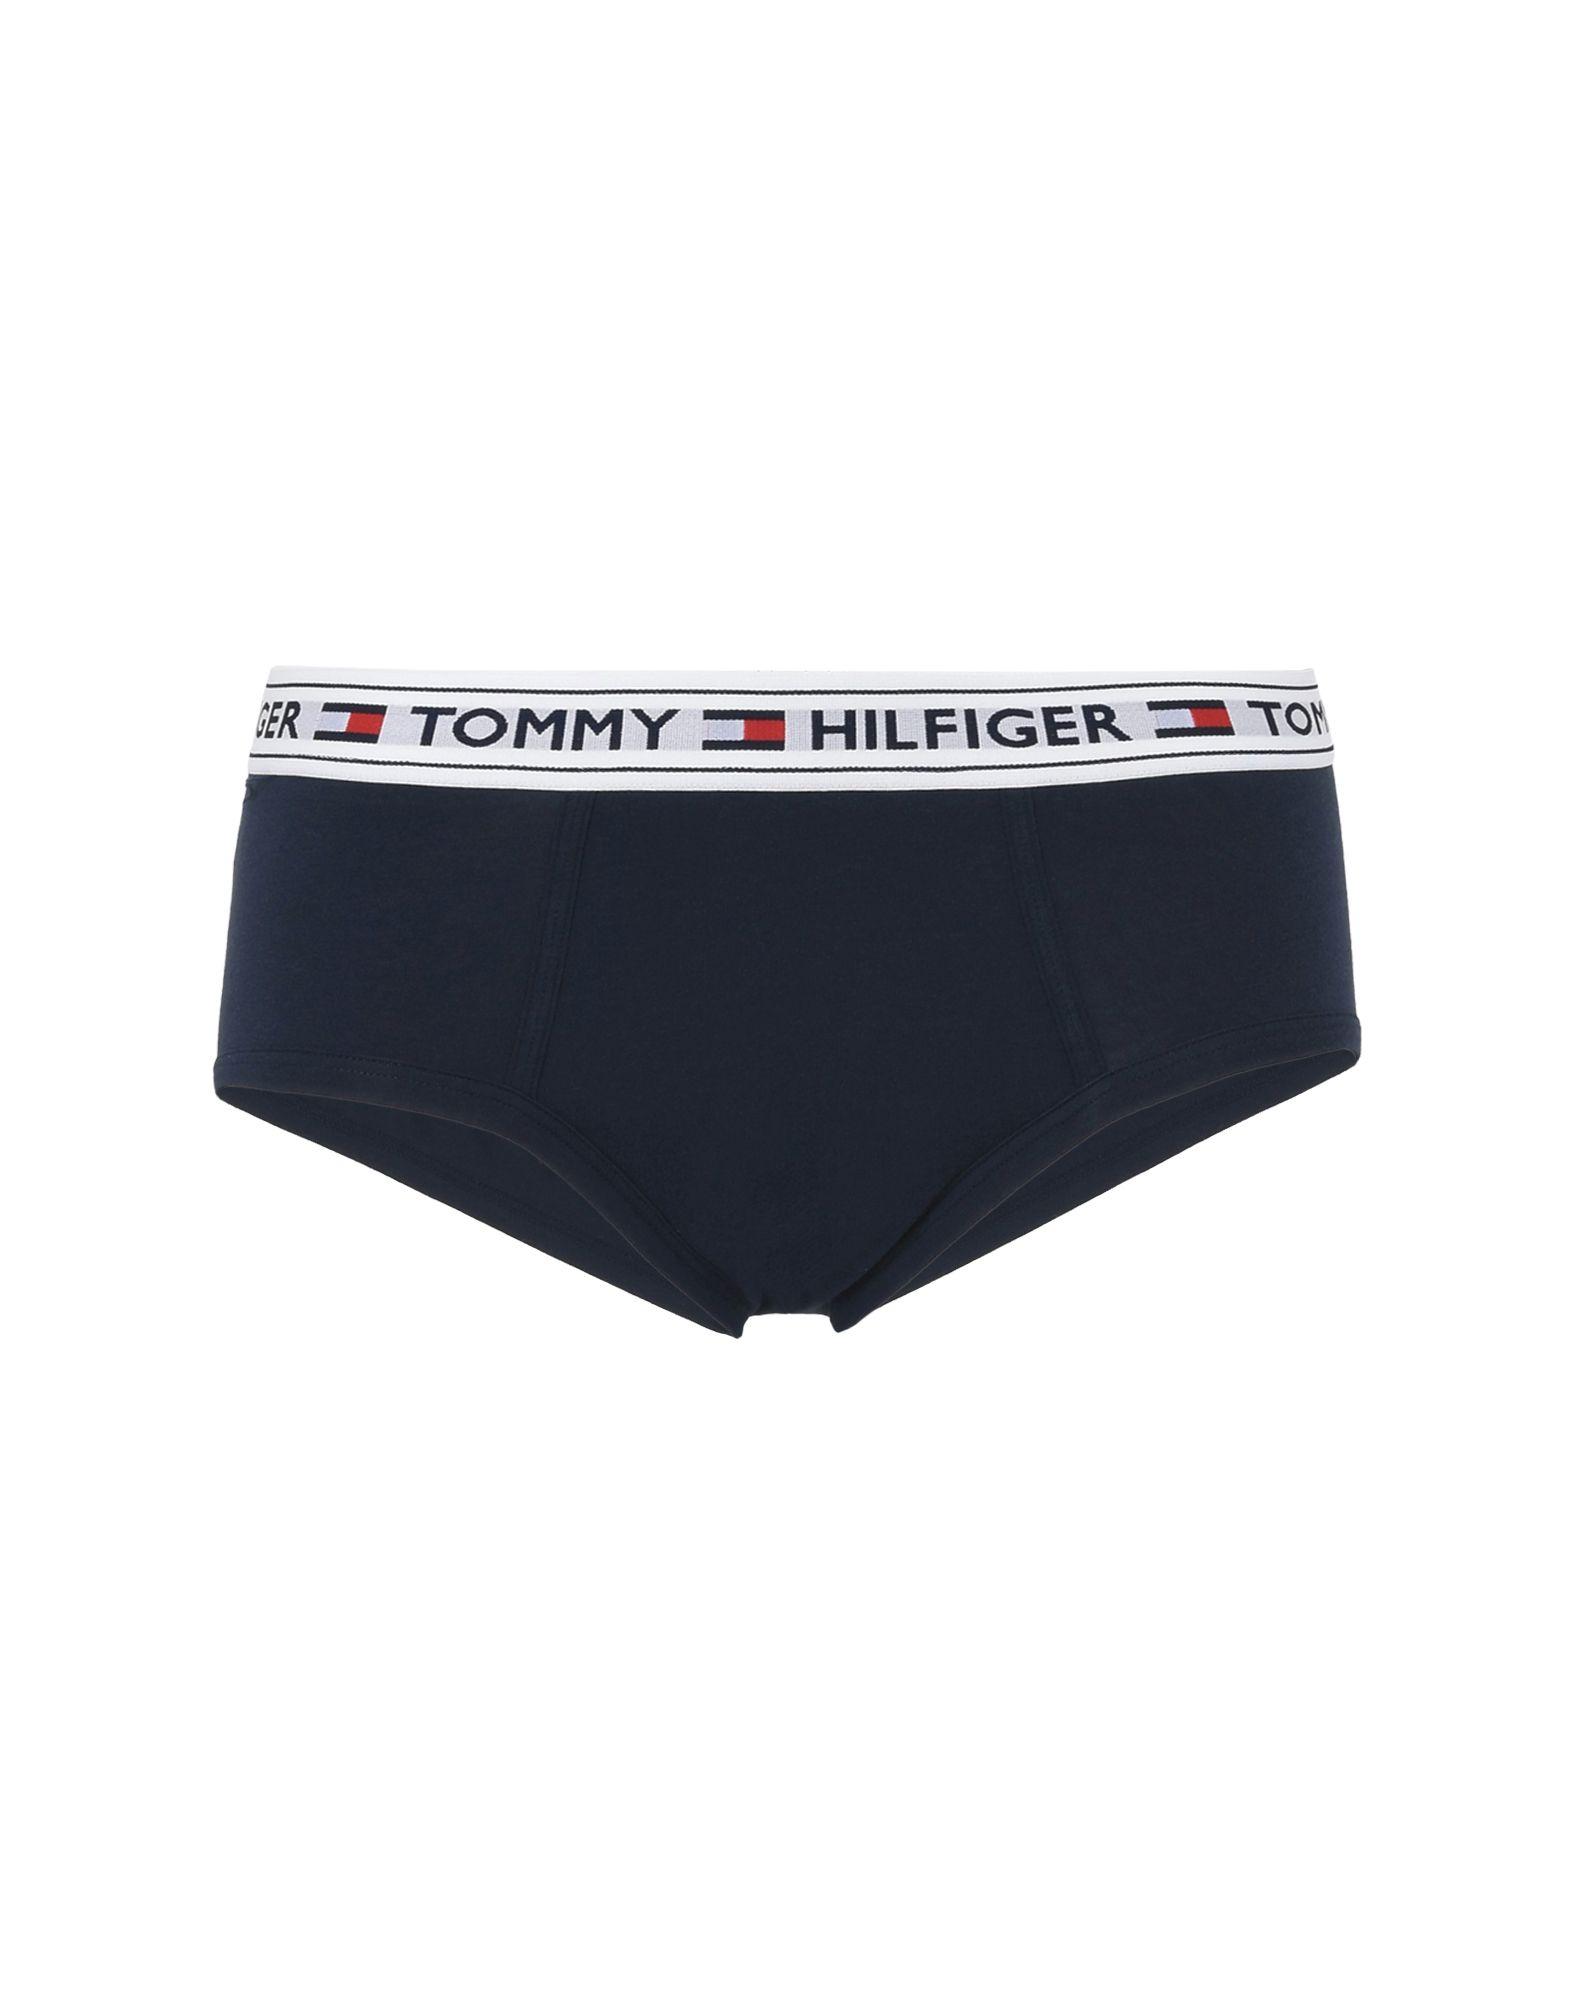 TOMMY HILFIGER Трусы сумка tommy hilfiger am0am00806 002 black